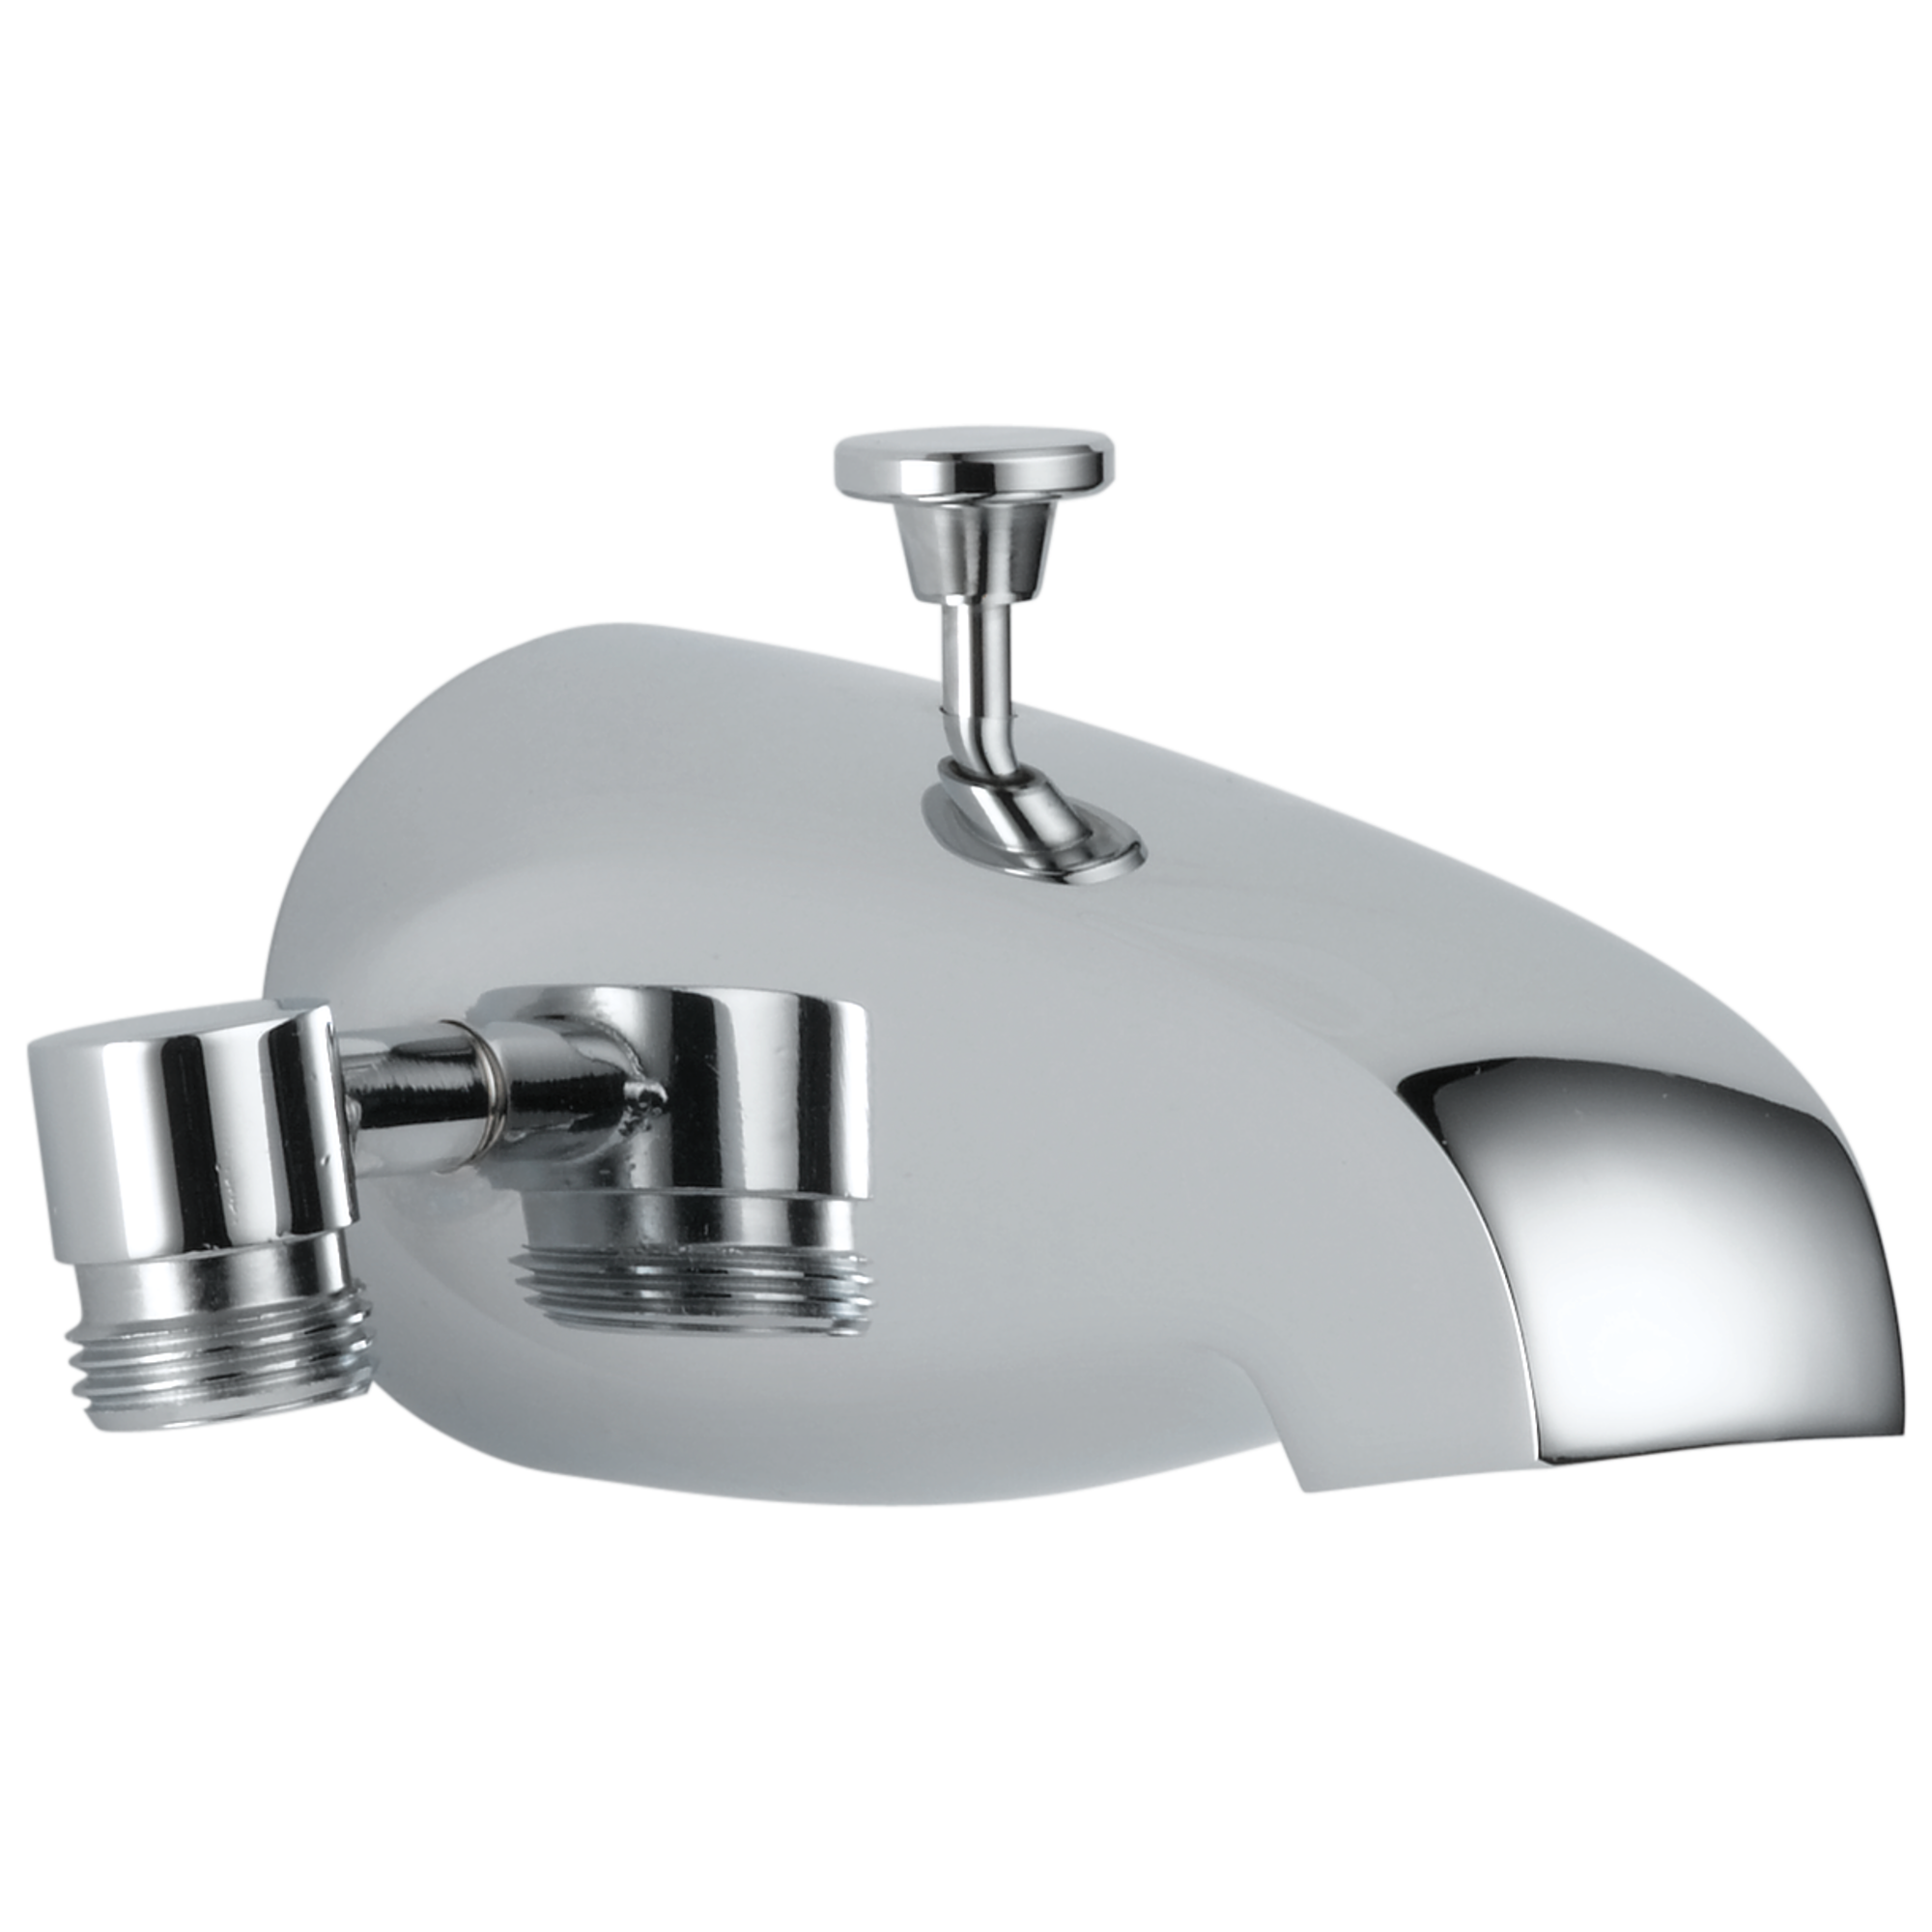 RP3914 Tub Spout Hand Shower Pull Up Diverter